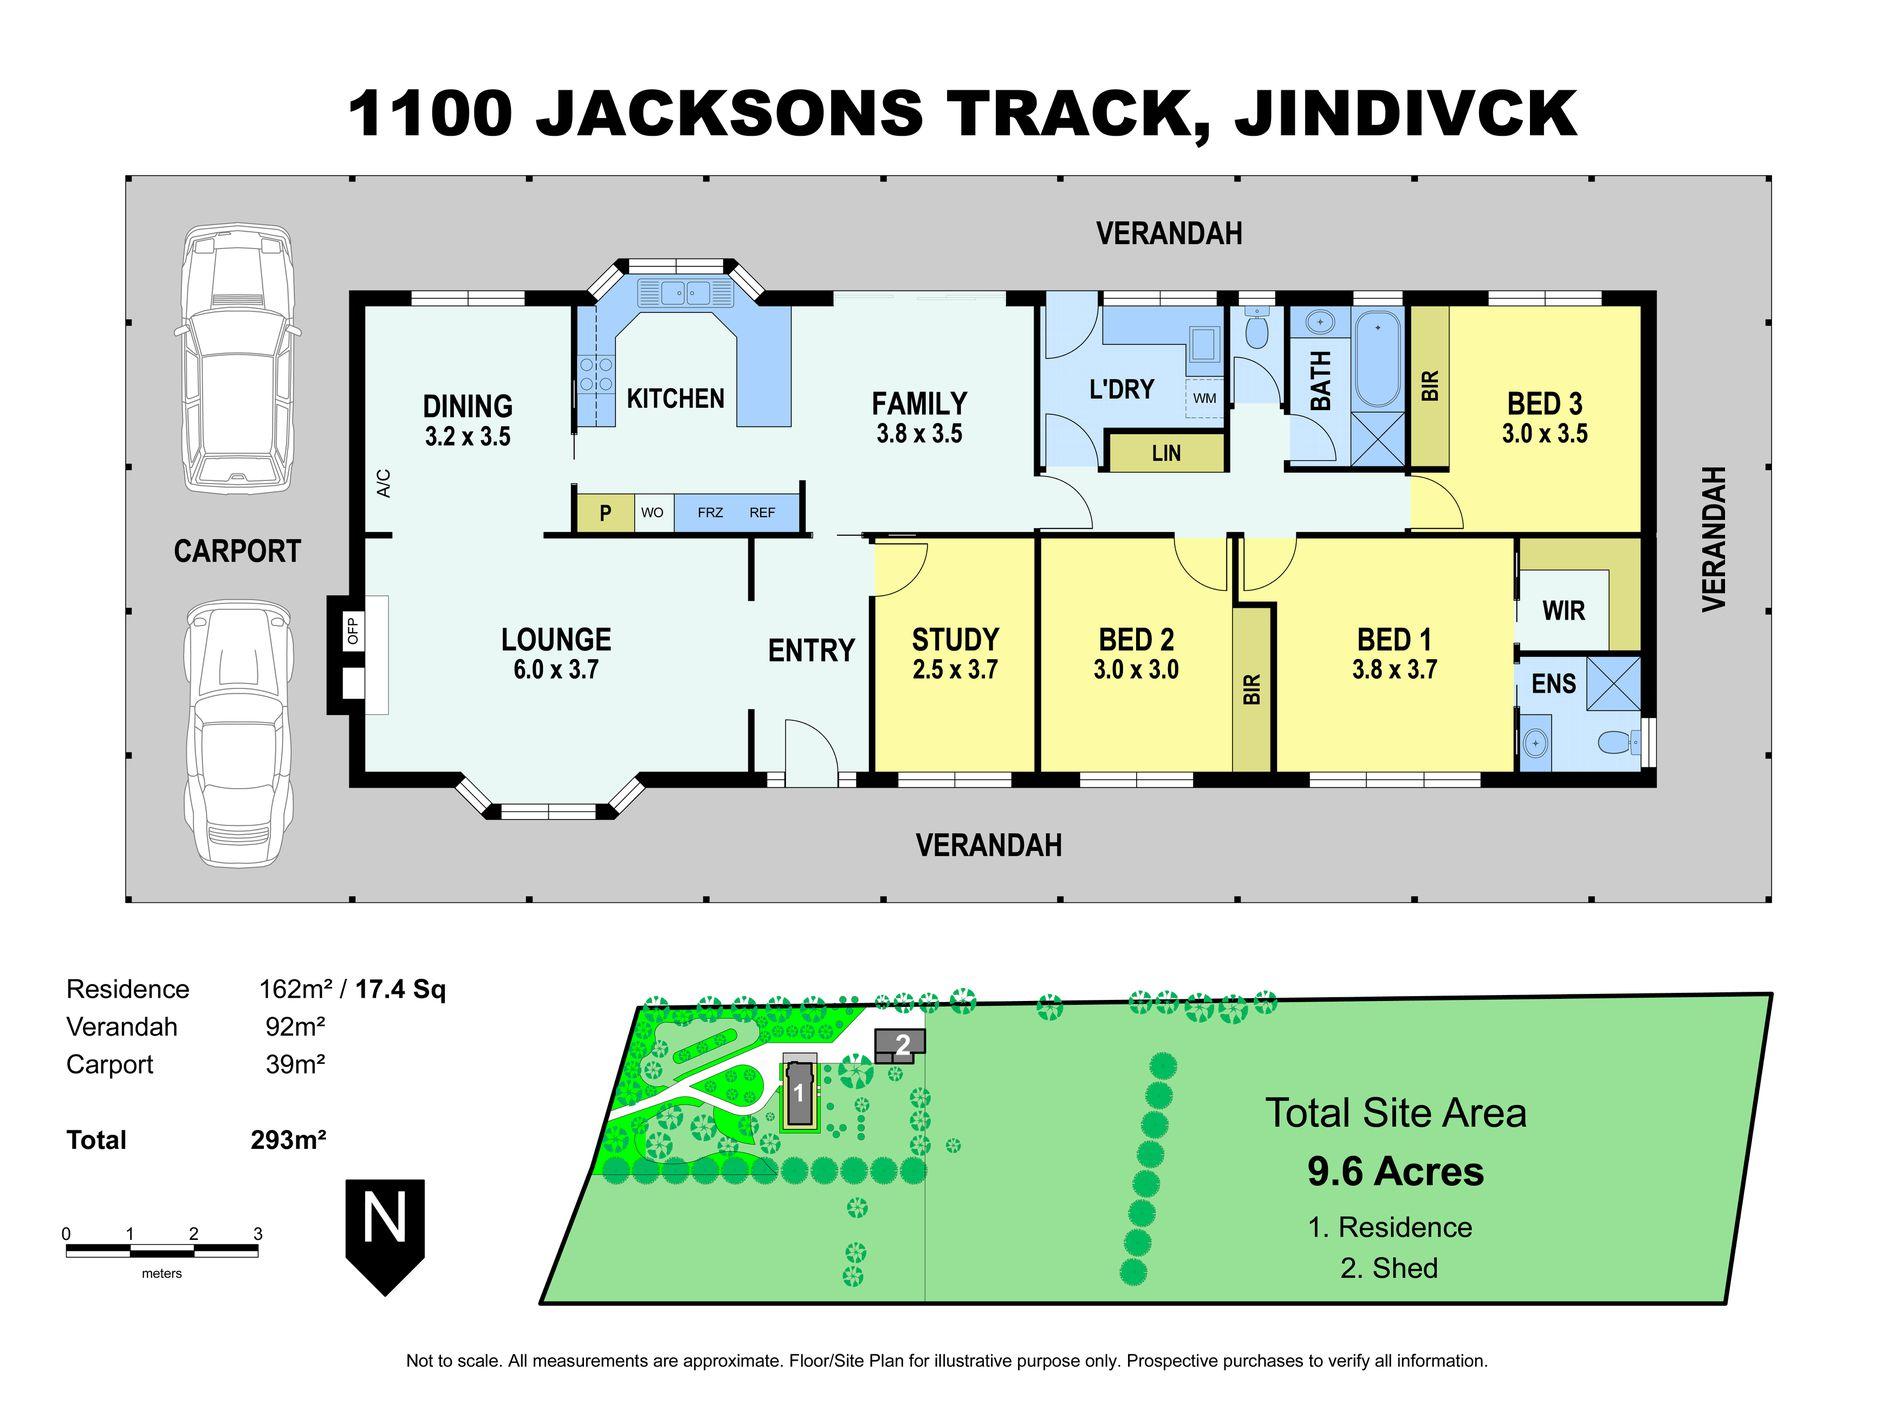 1100 Jacksons Track, Jindivick